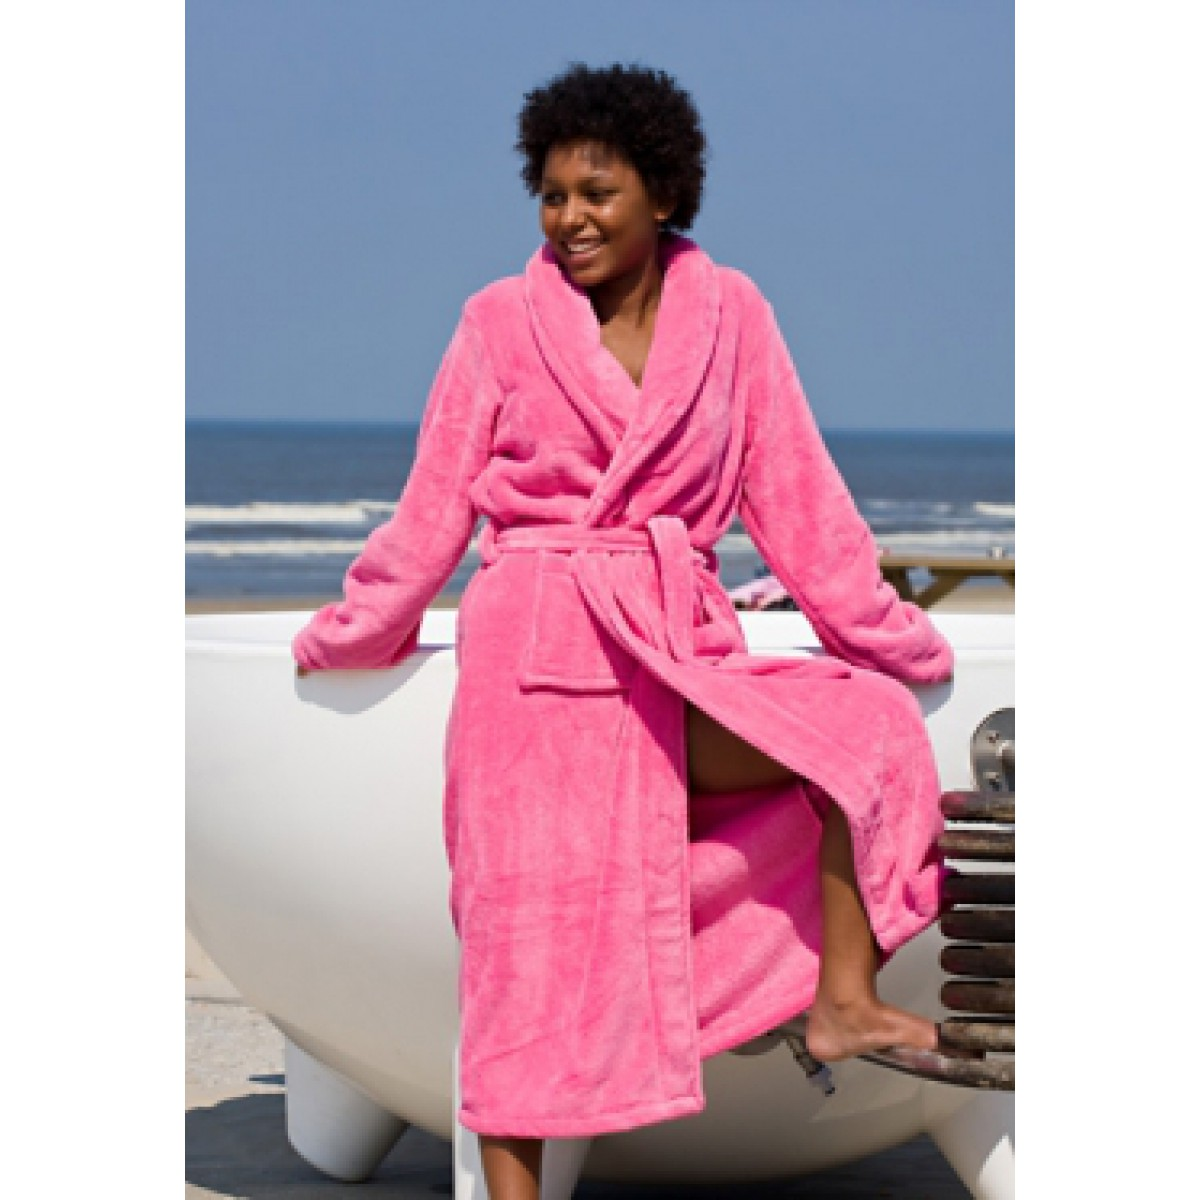 Damen-bademantel rosa